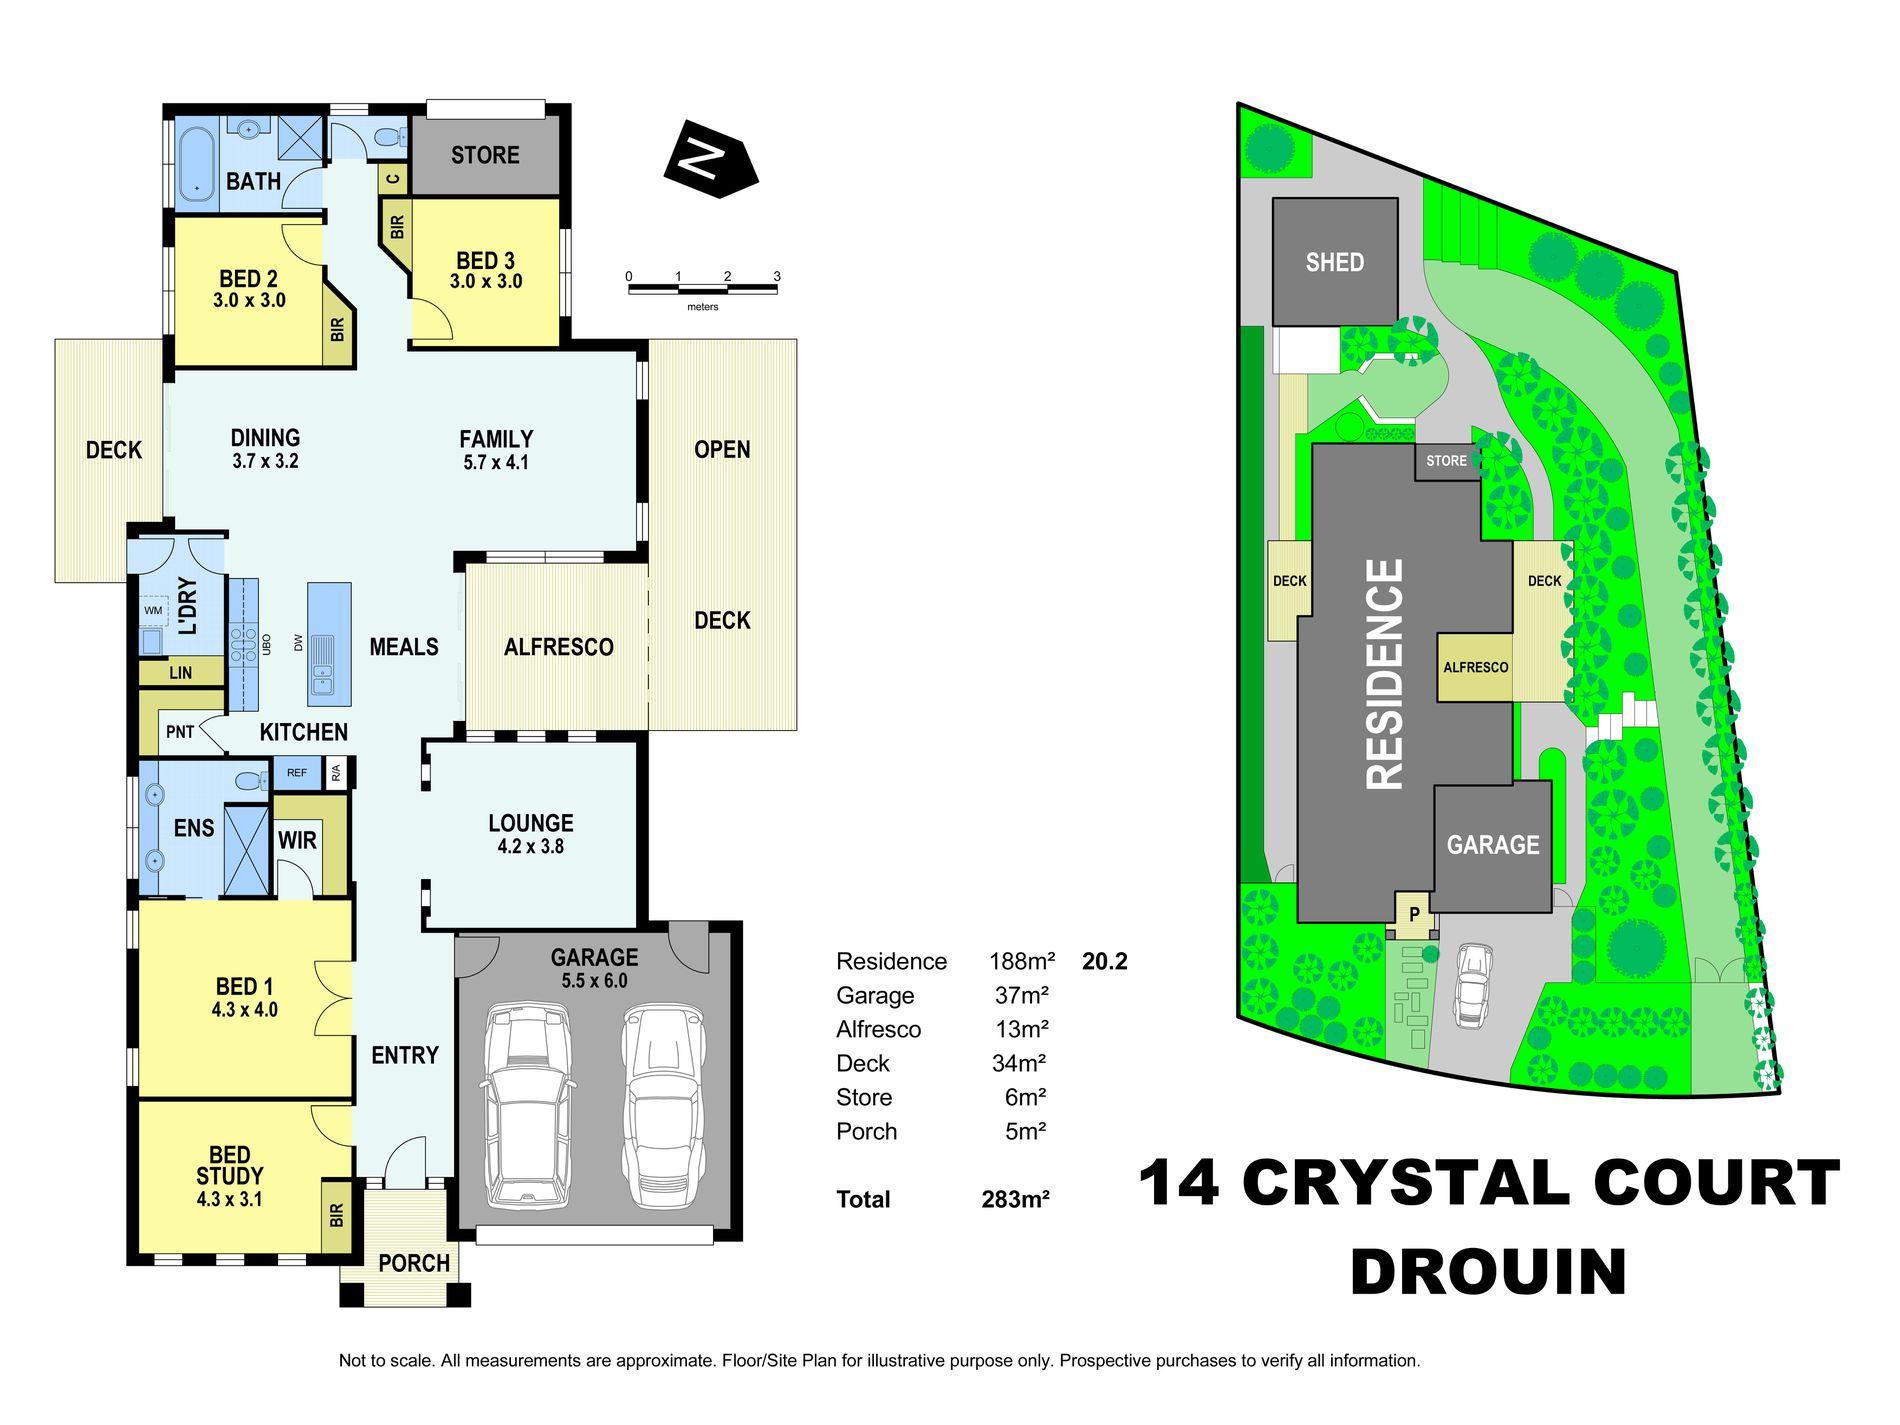 14 Crystal Court, Drouin